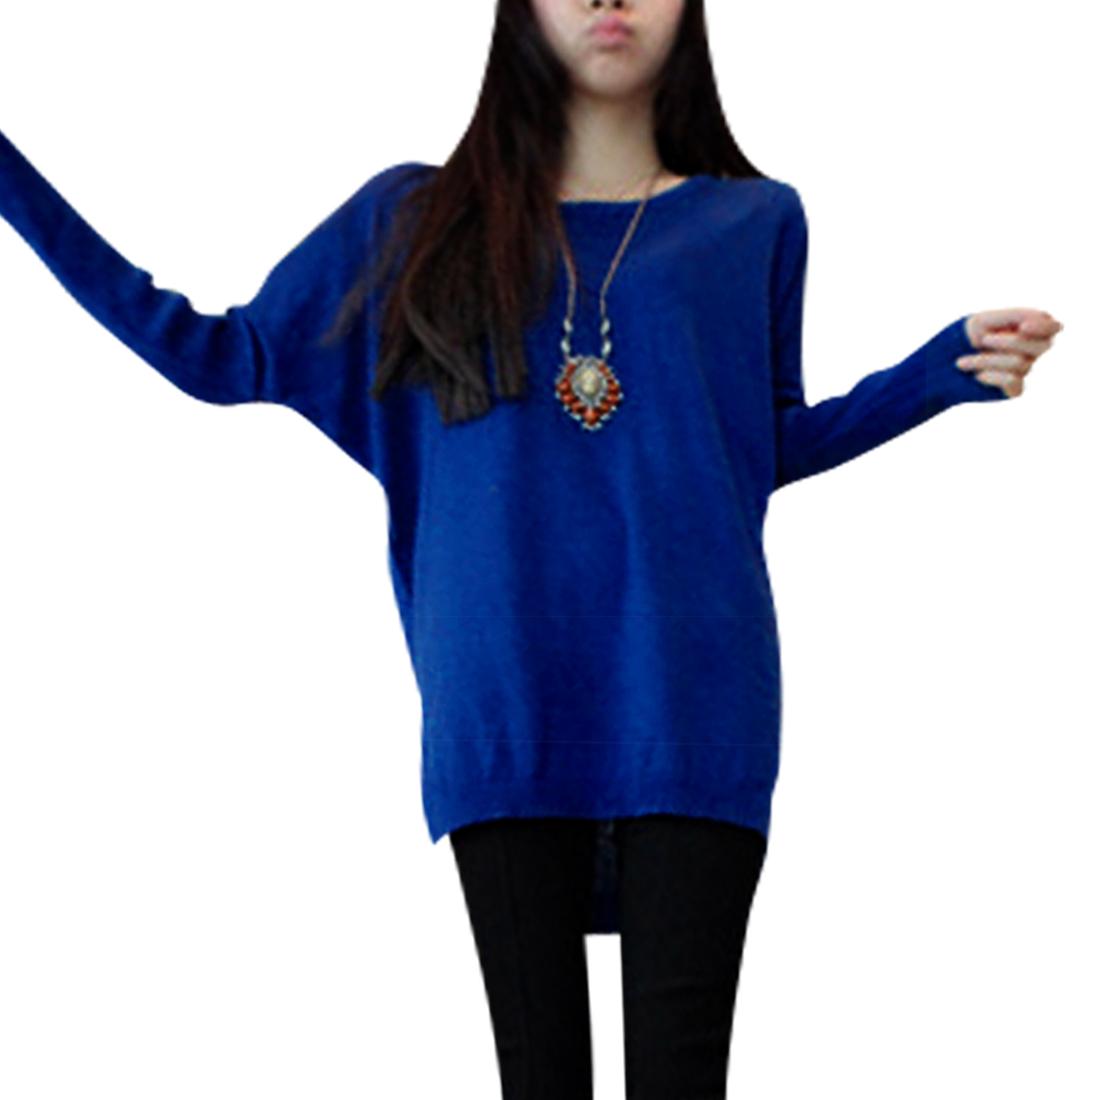 Women Loose Batwing Sleeve Royal Blue Knit Tunic Shirt XS